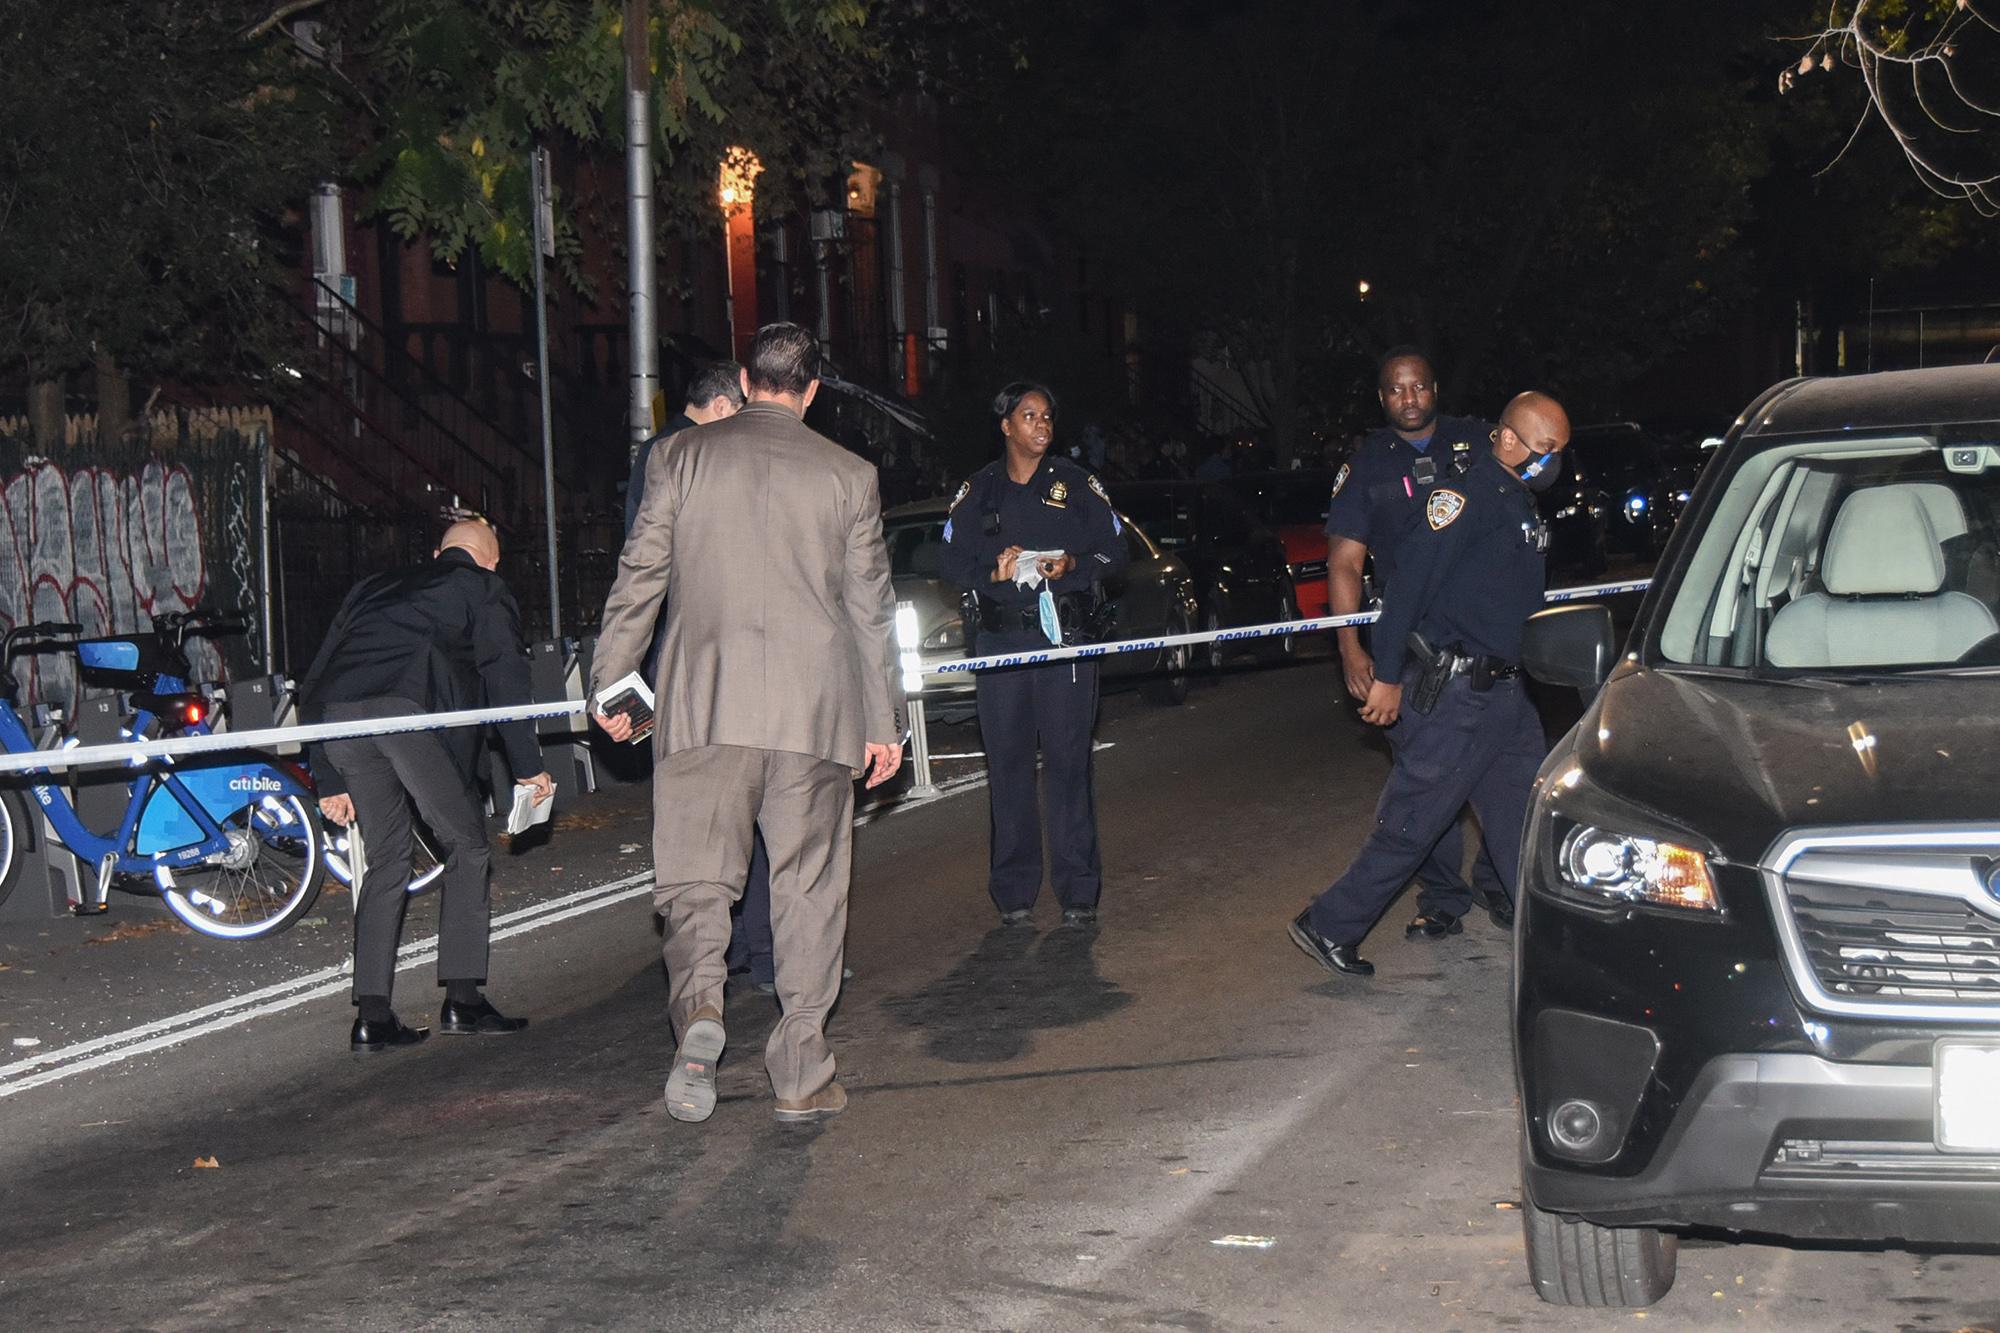 7 shot, 1 killed in overnight shootings in Big Apple